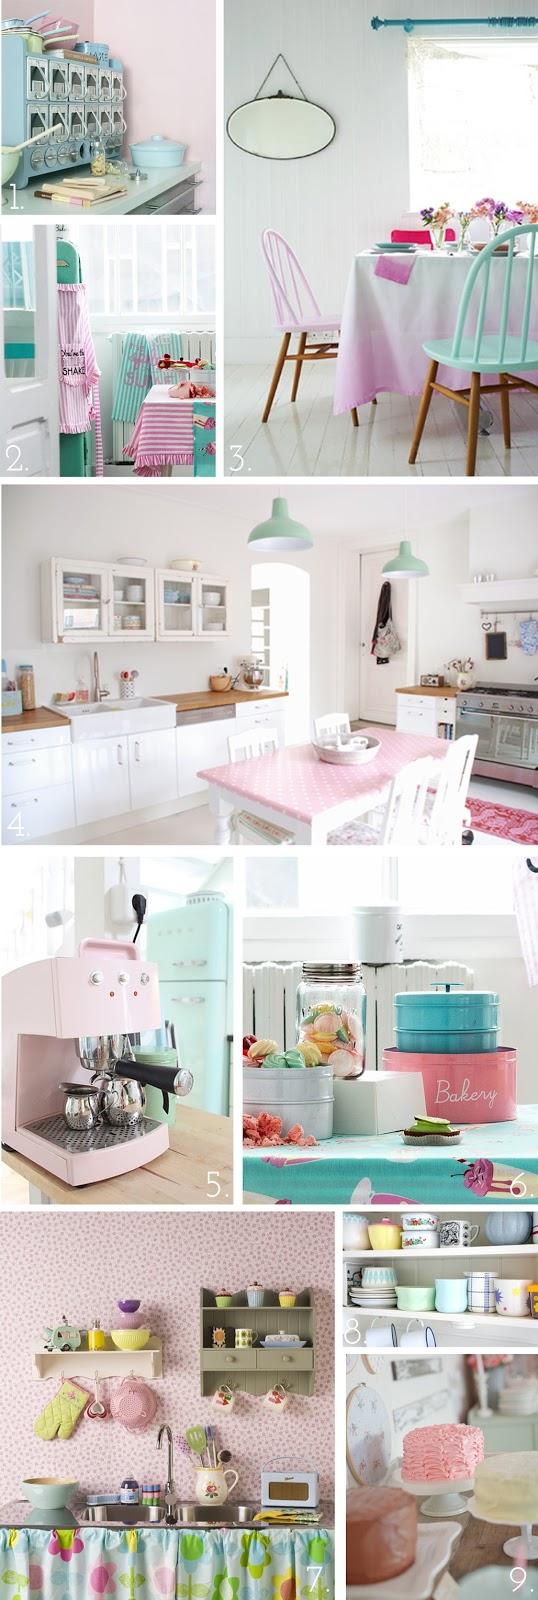 The Pink Doormat Pretty Pastel Kitchen Inspiration